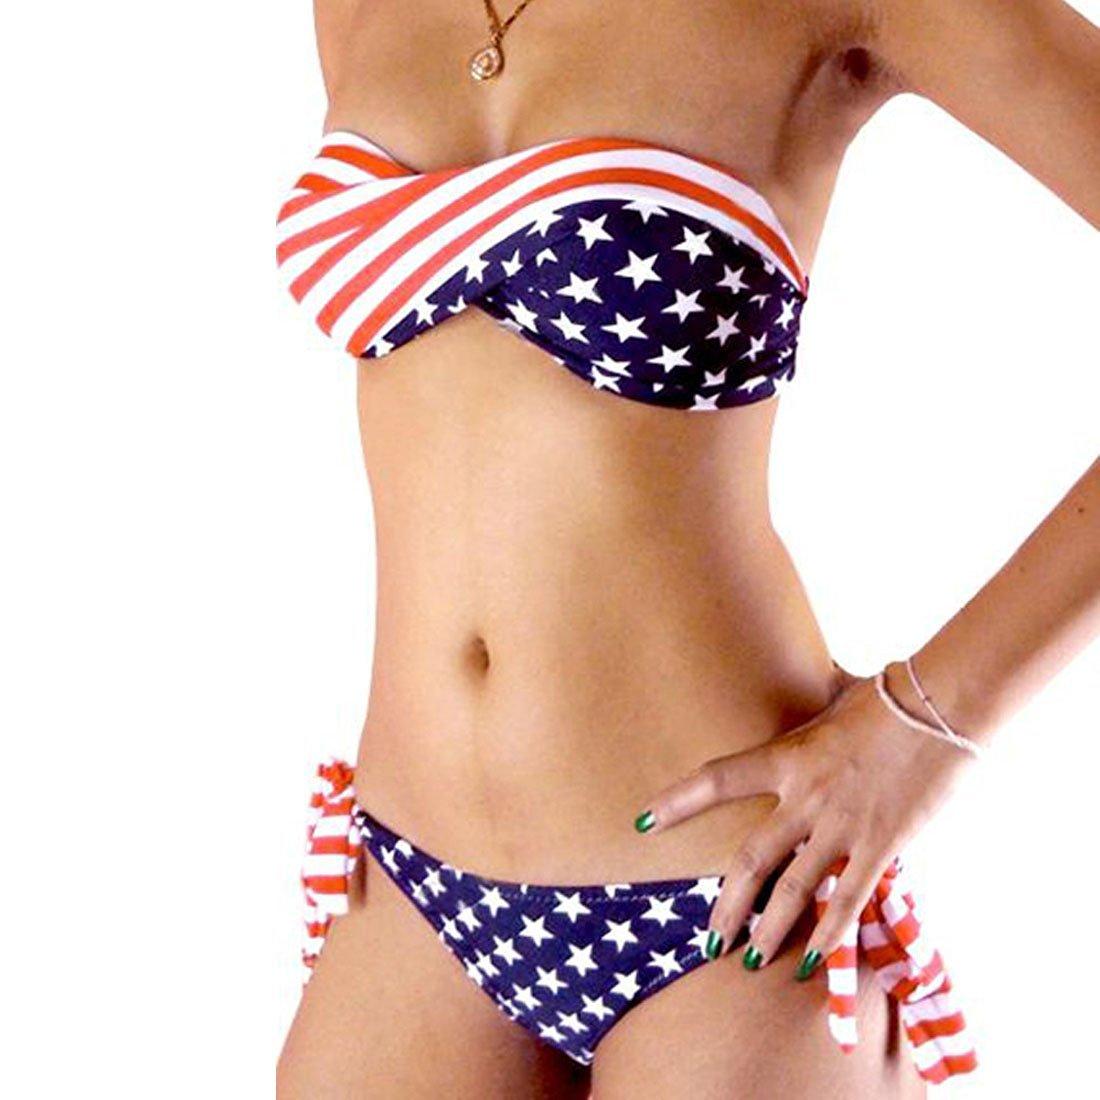 66d647ad62ce8 Get Quotations · USA Stars and Stripes Bikini